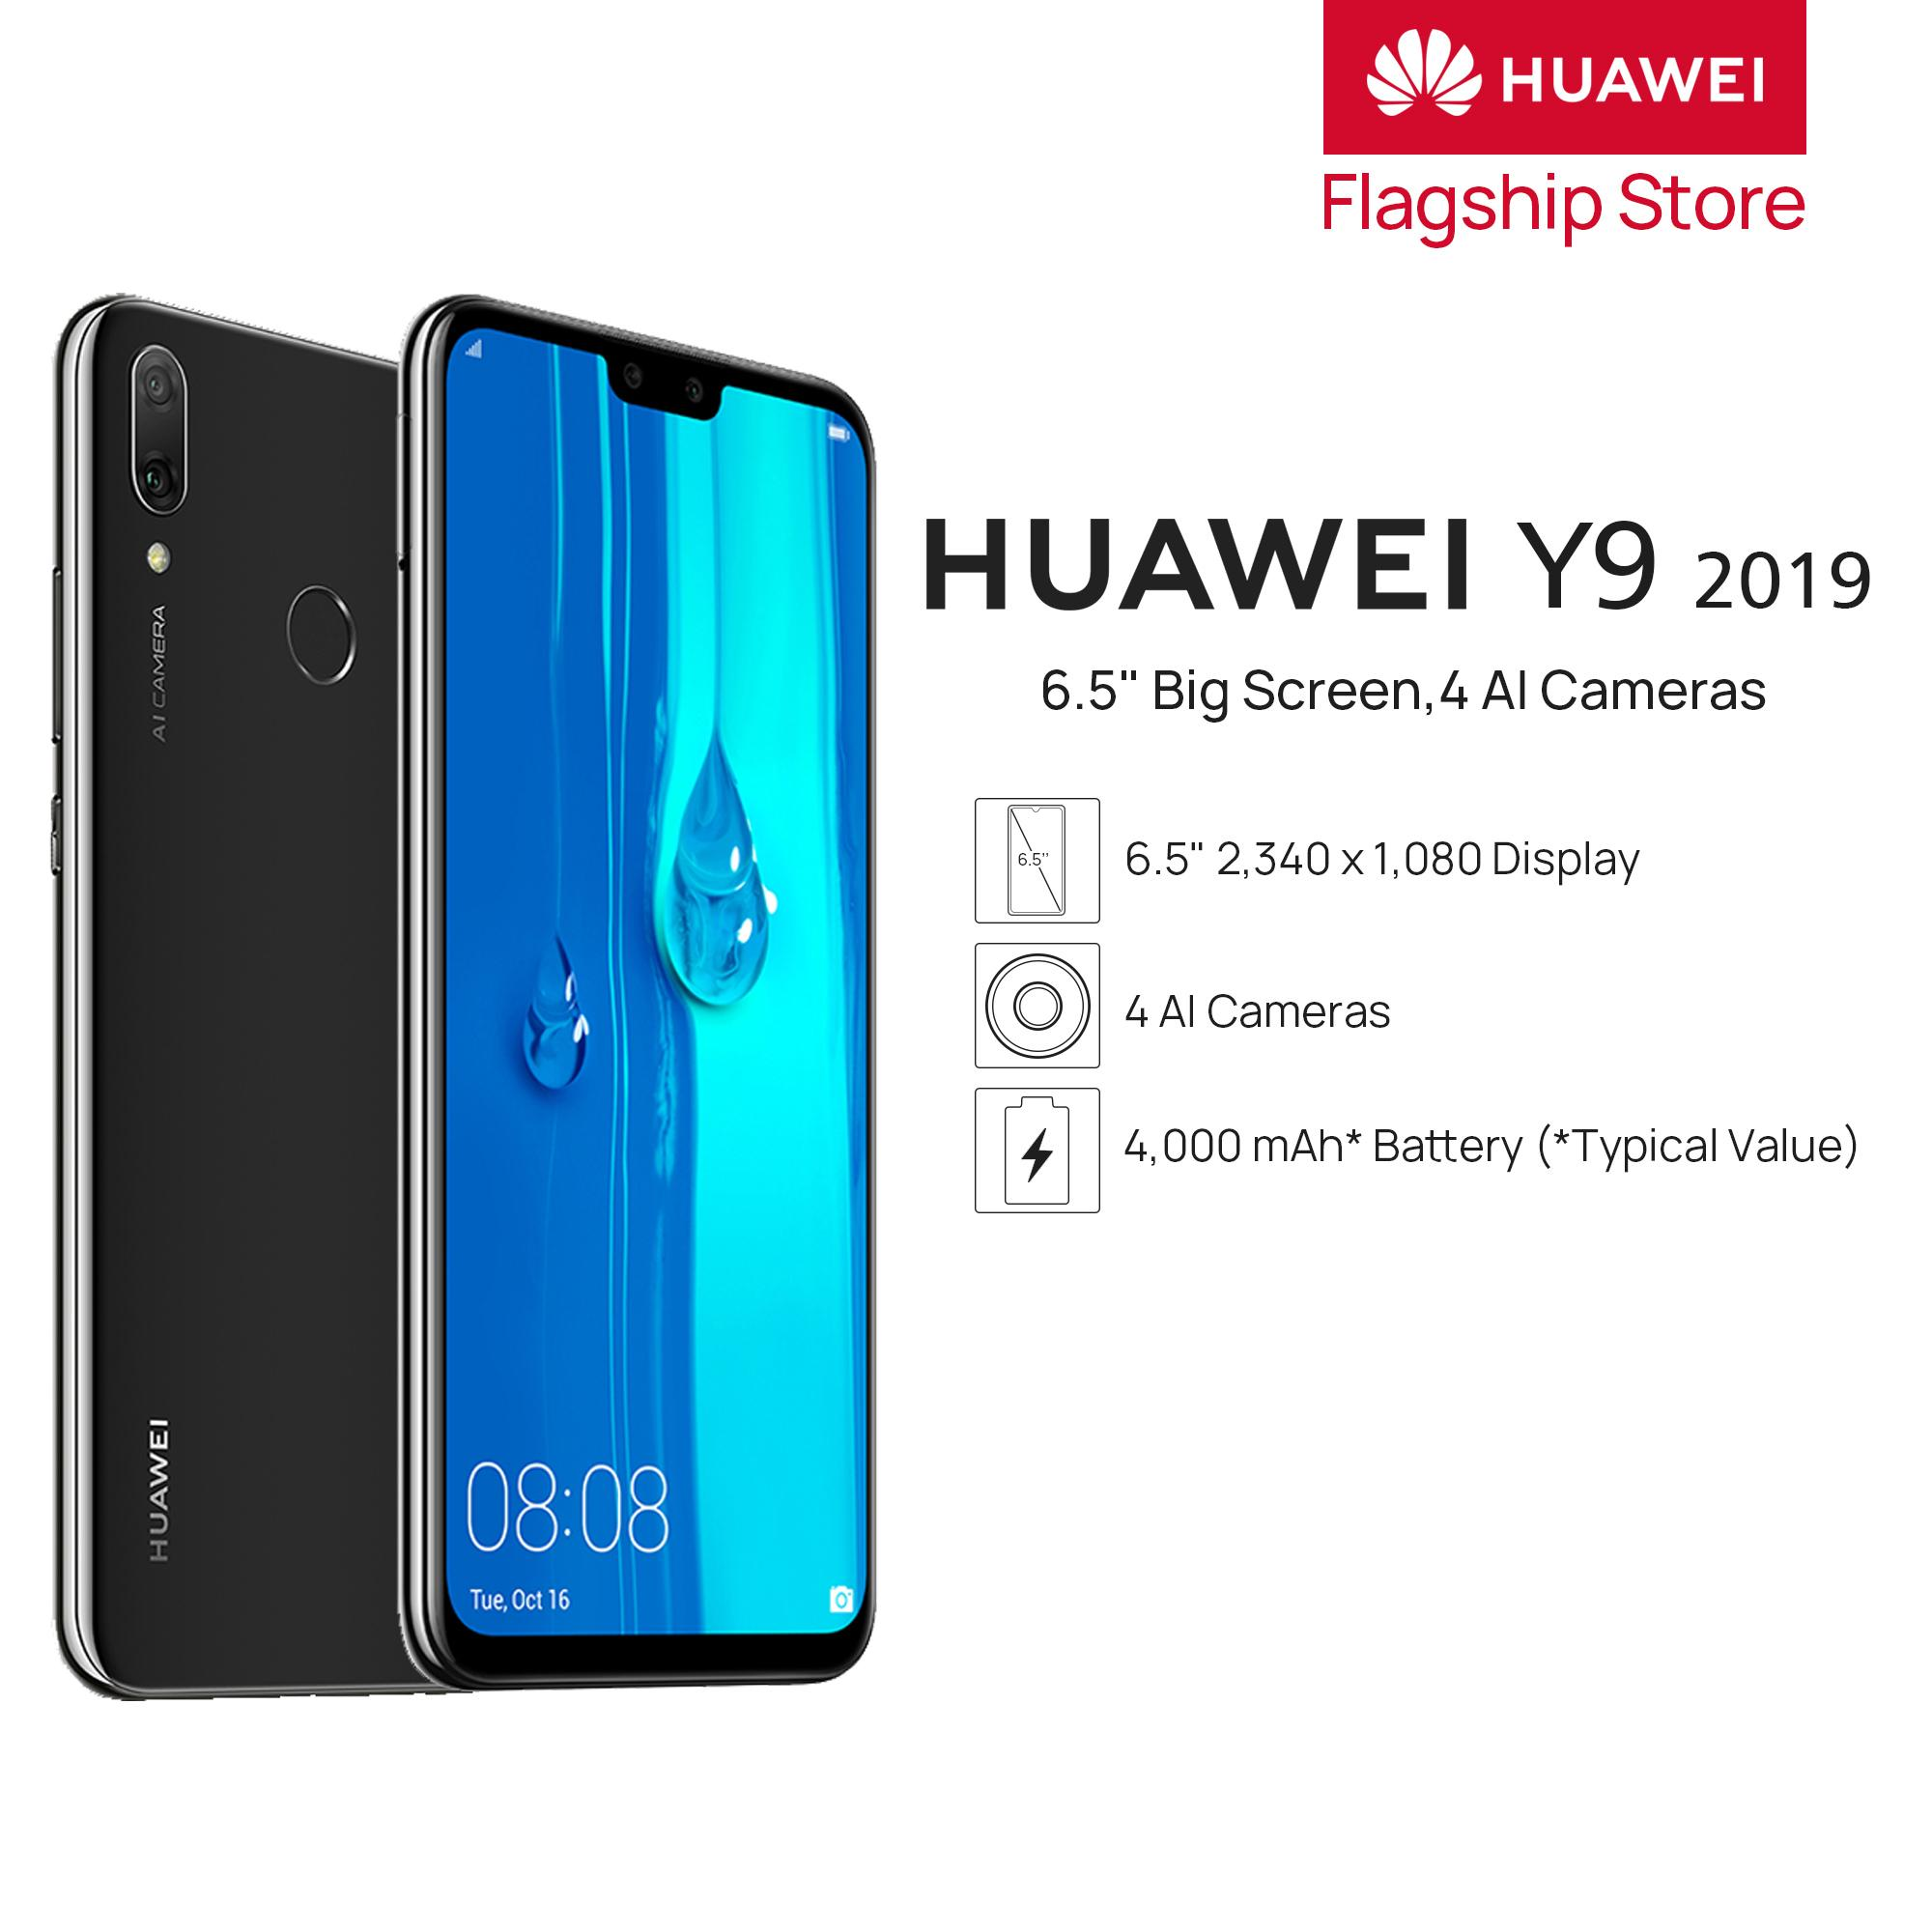 Huawei Y9 2019 4GB RAM 64GB ROM Smart Phone